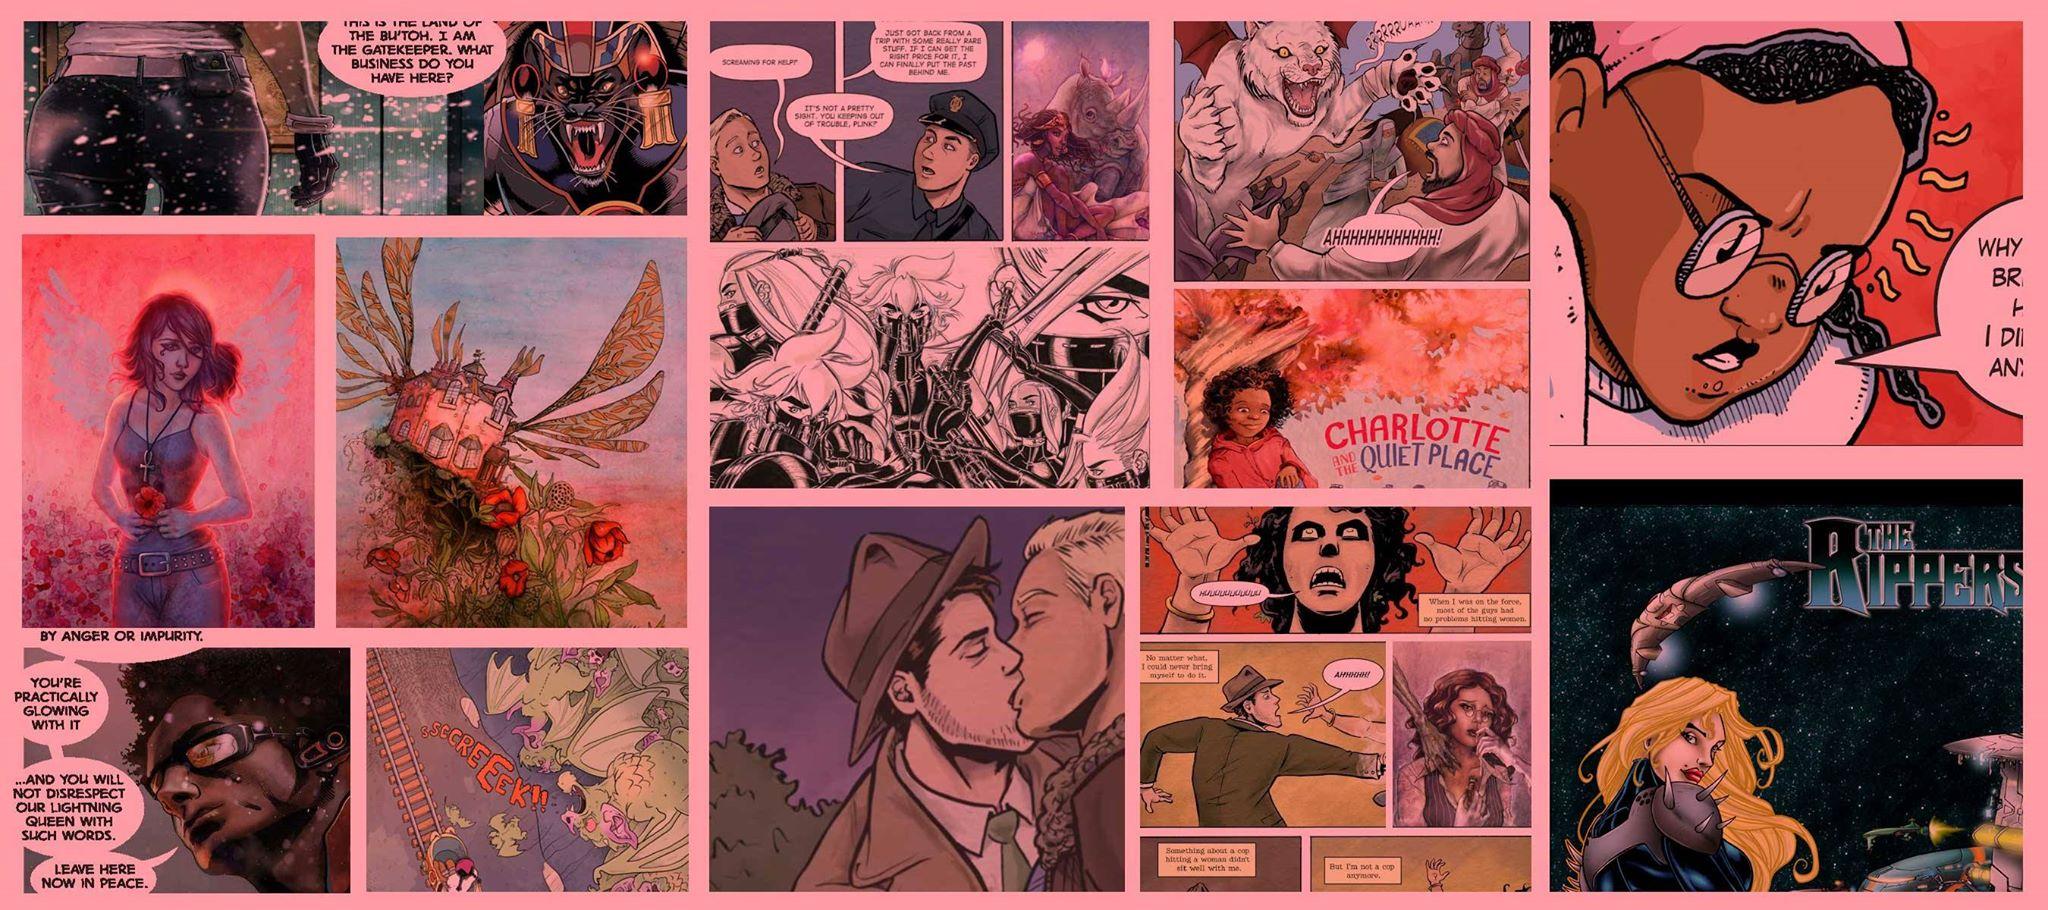 Women in Comics Collective International